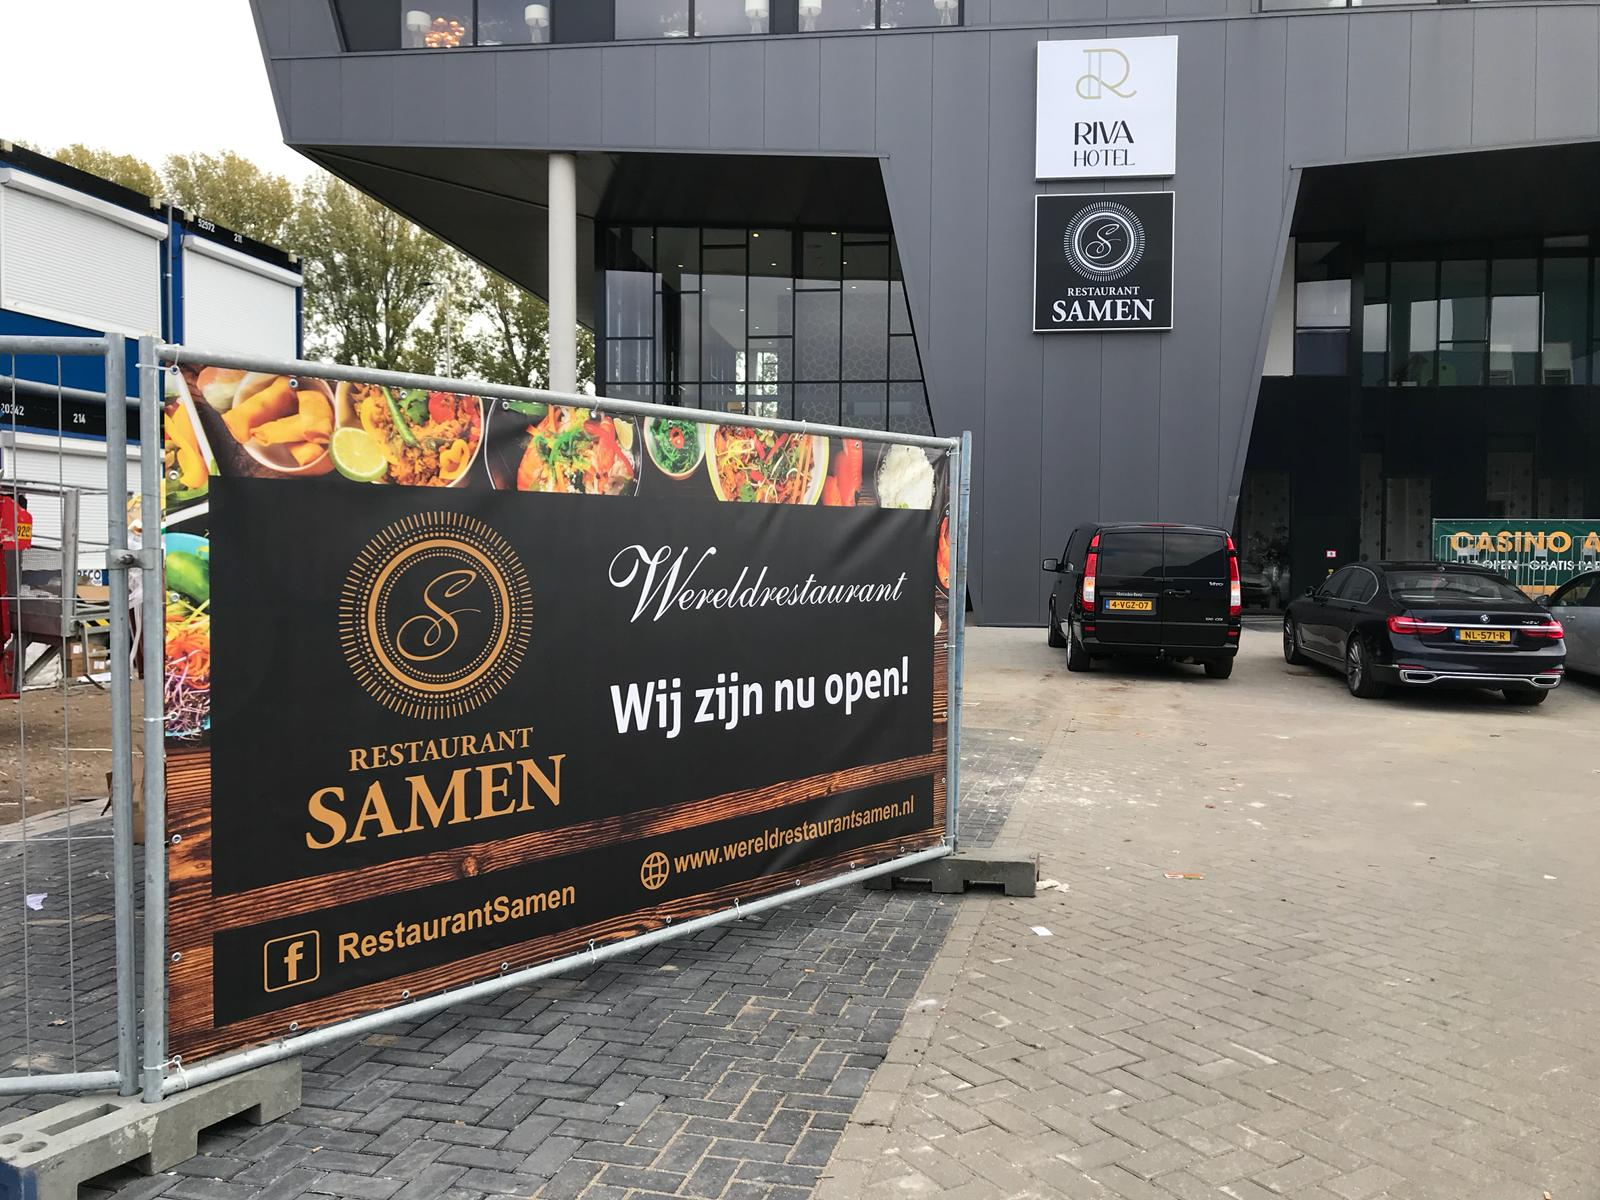 Spandoek Wereld Restaurant Samen